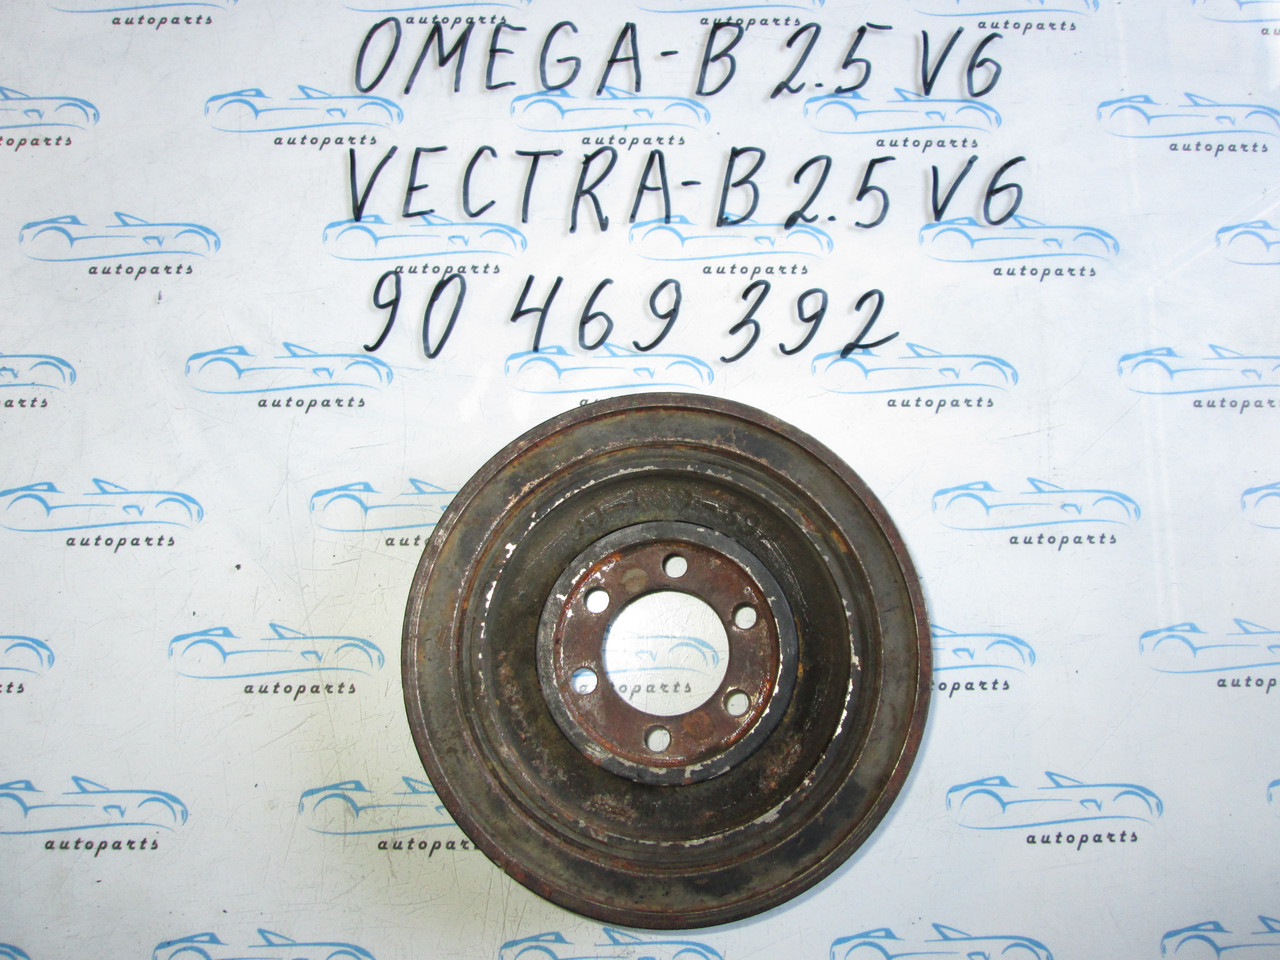 Шкив коленвала Vectra B 2.5 V6, X25XE, 90469392